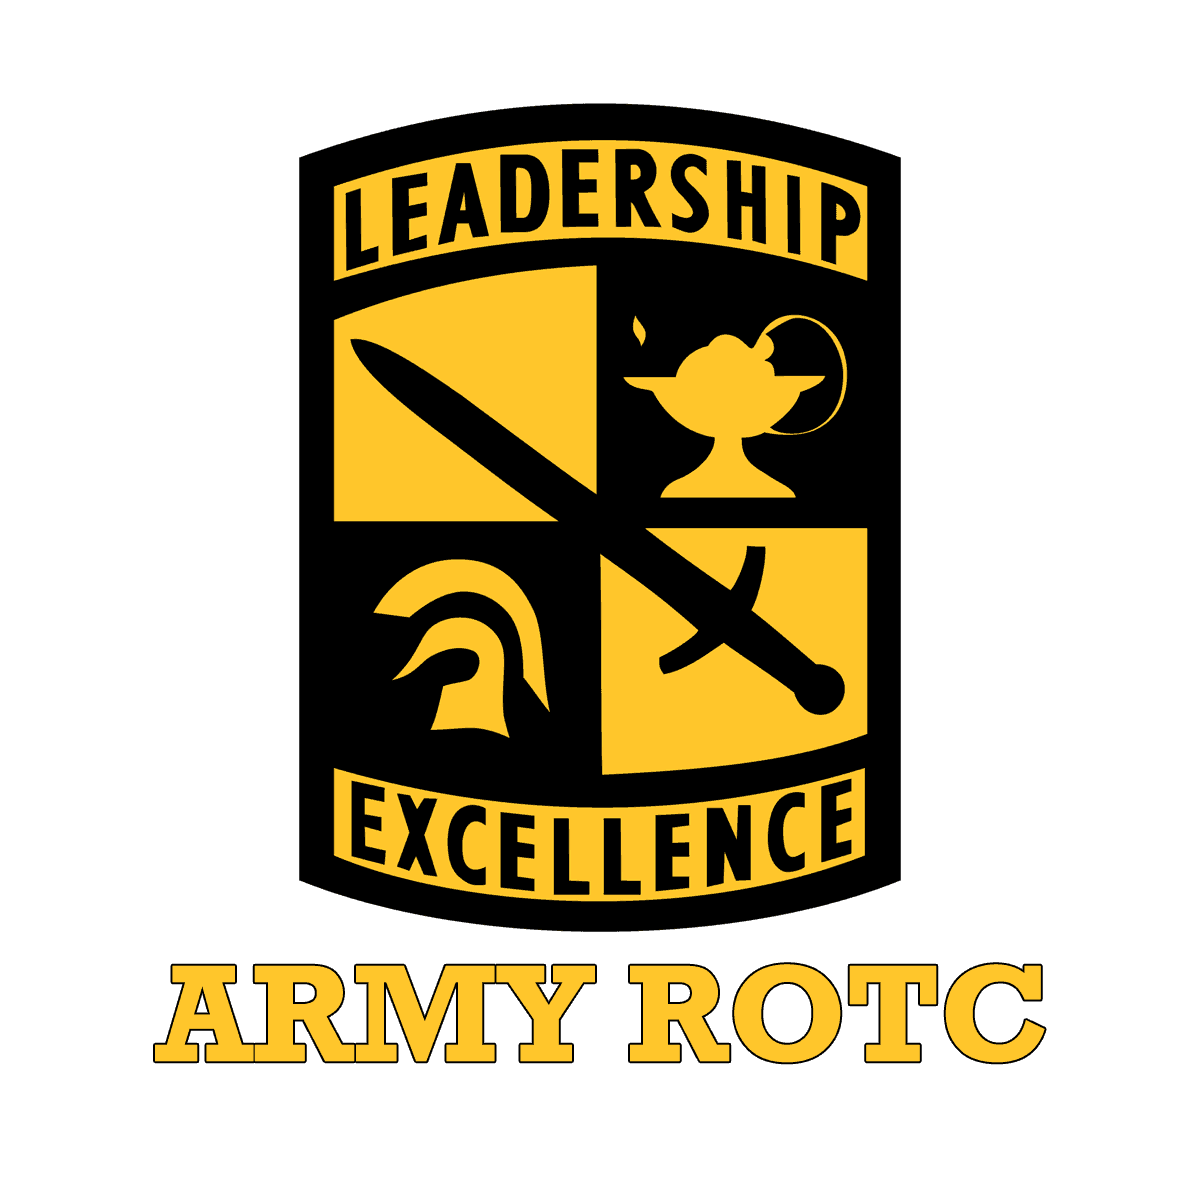 Us army rotc logo